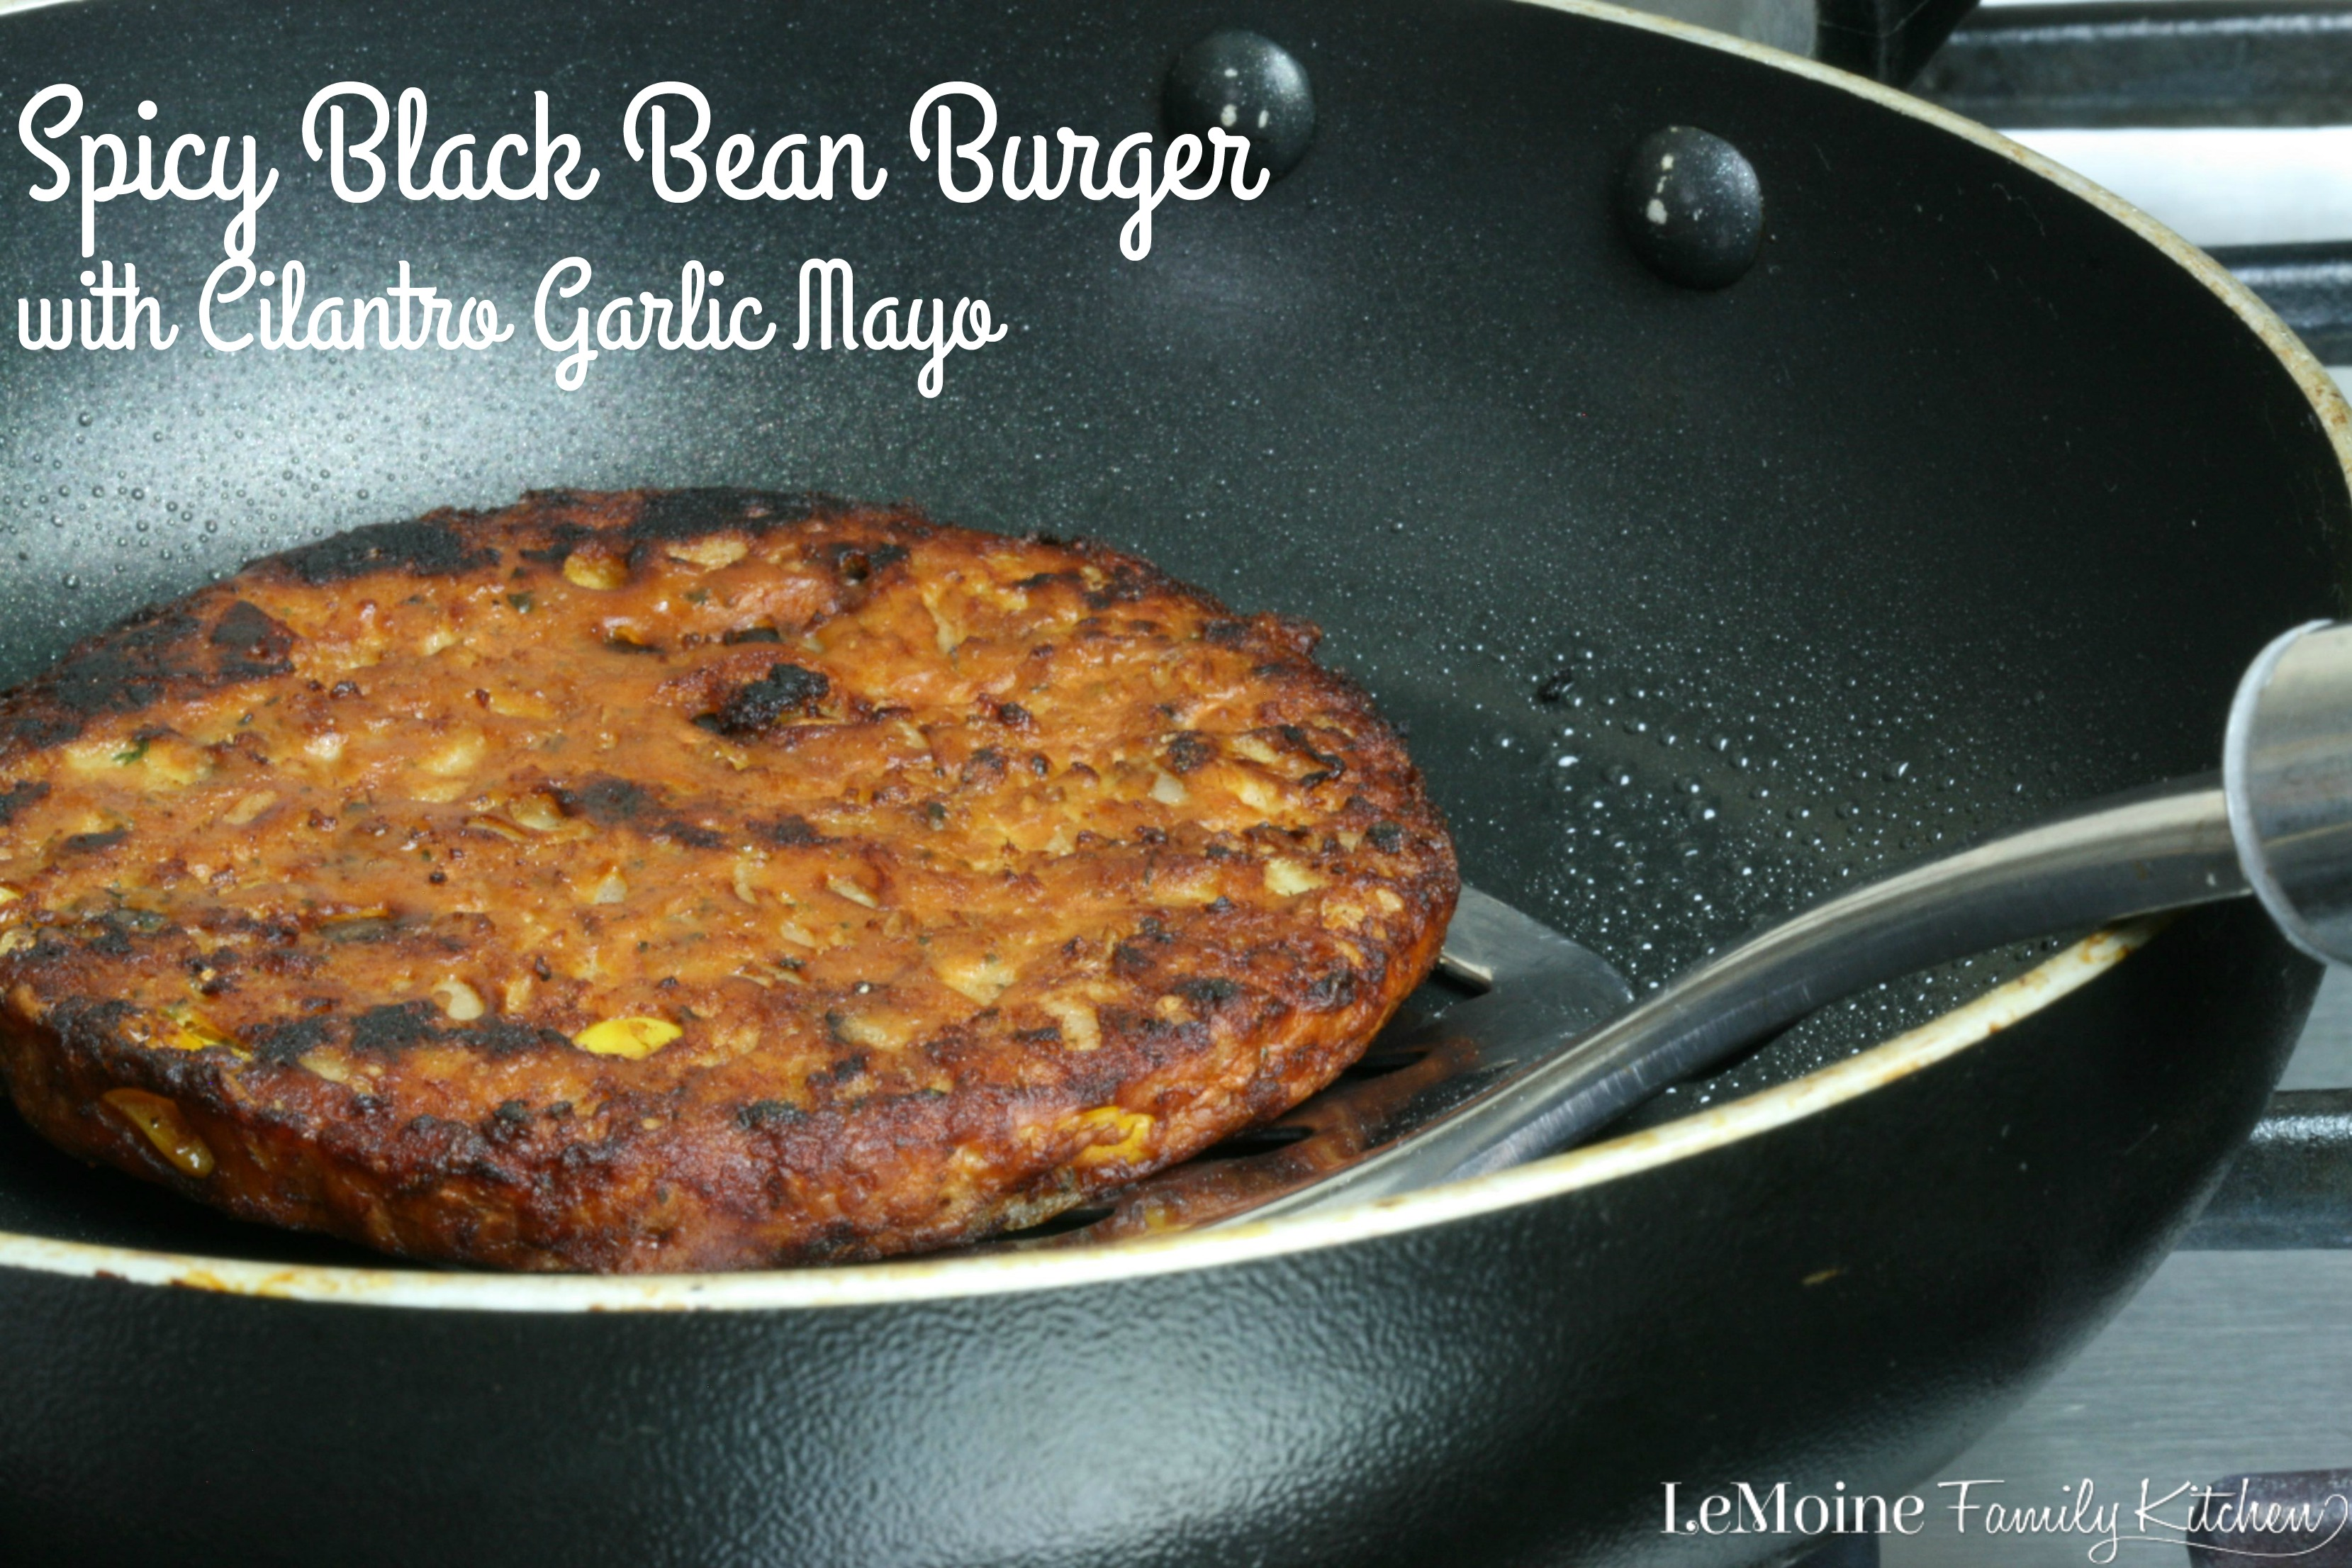 Spicy Black Bean Burger With Cilantro Garlic Mayo Lemoine Family